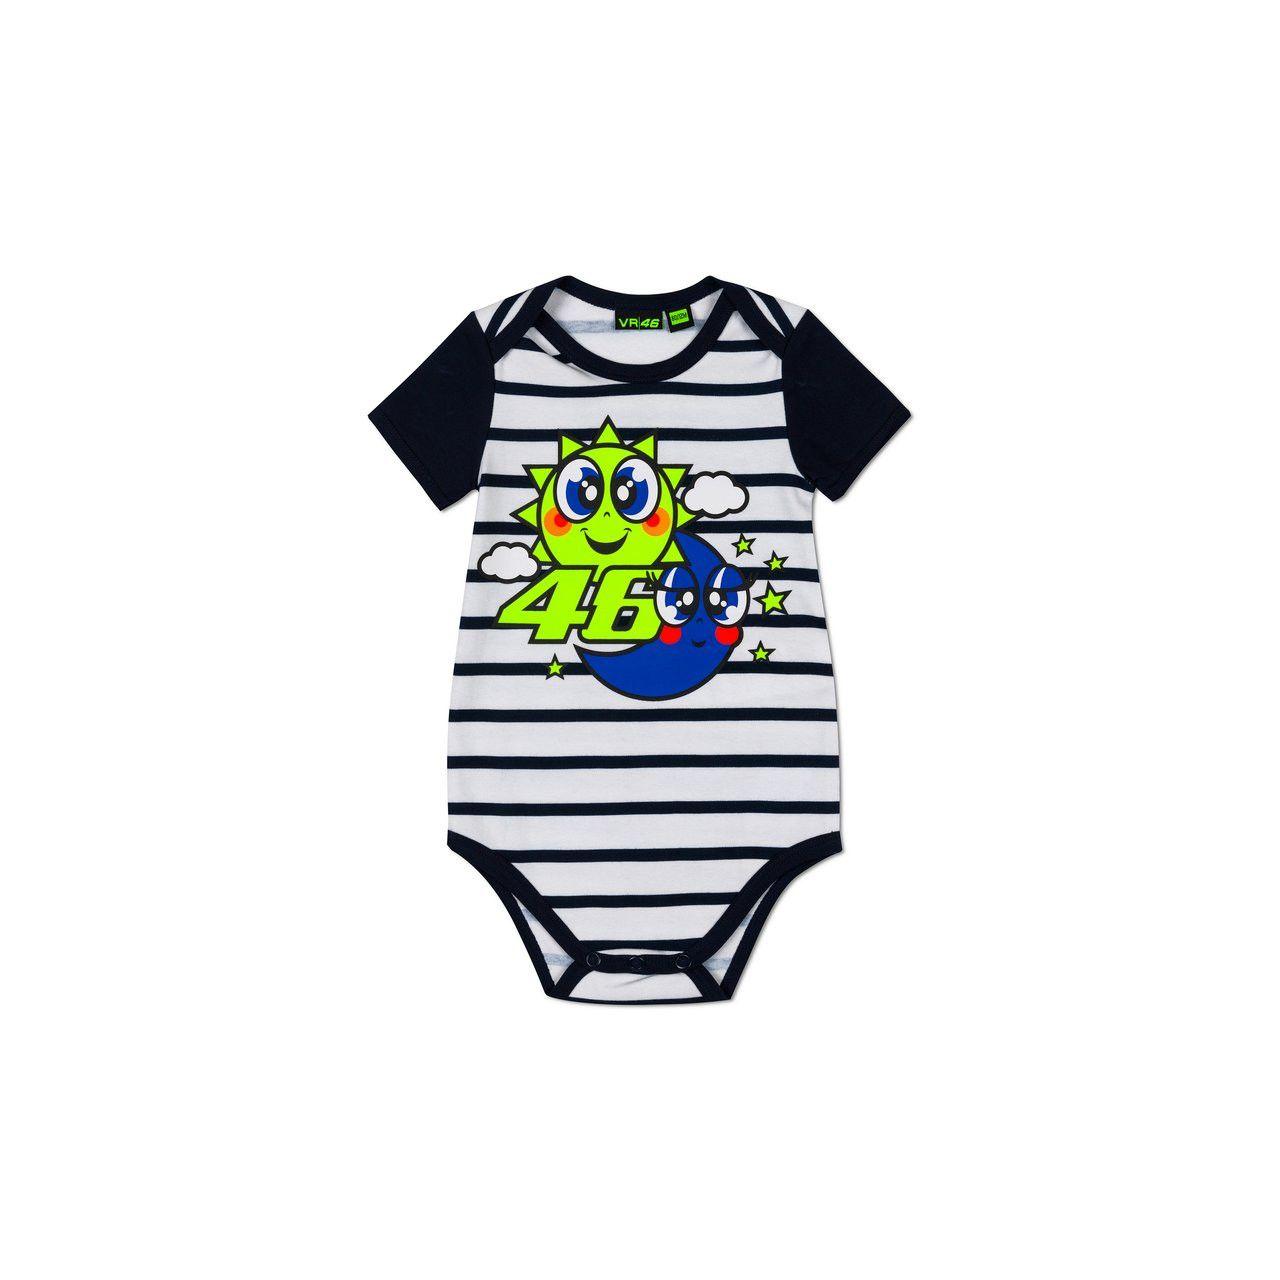 VALENTINO ROSSI Body bébé VR46 2020 Soleil et Lune